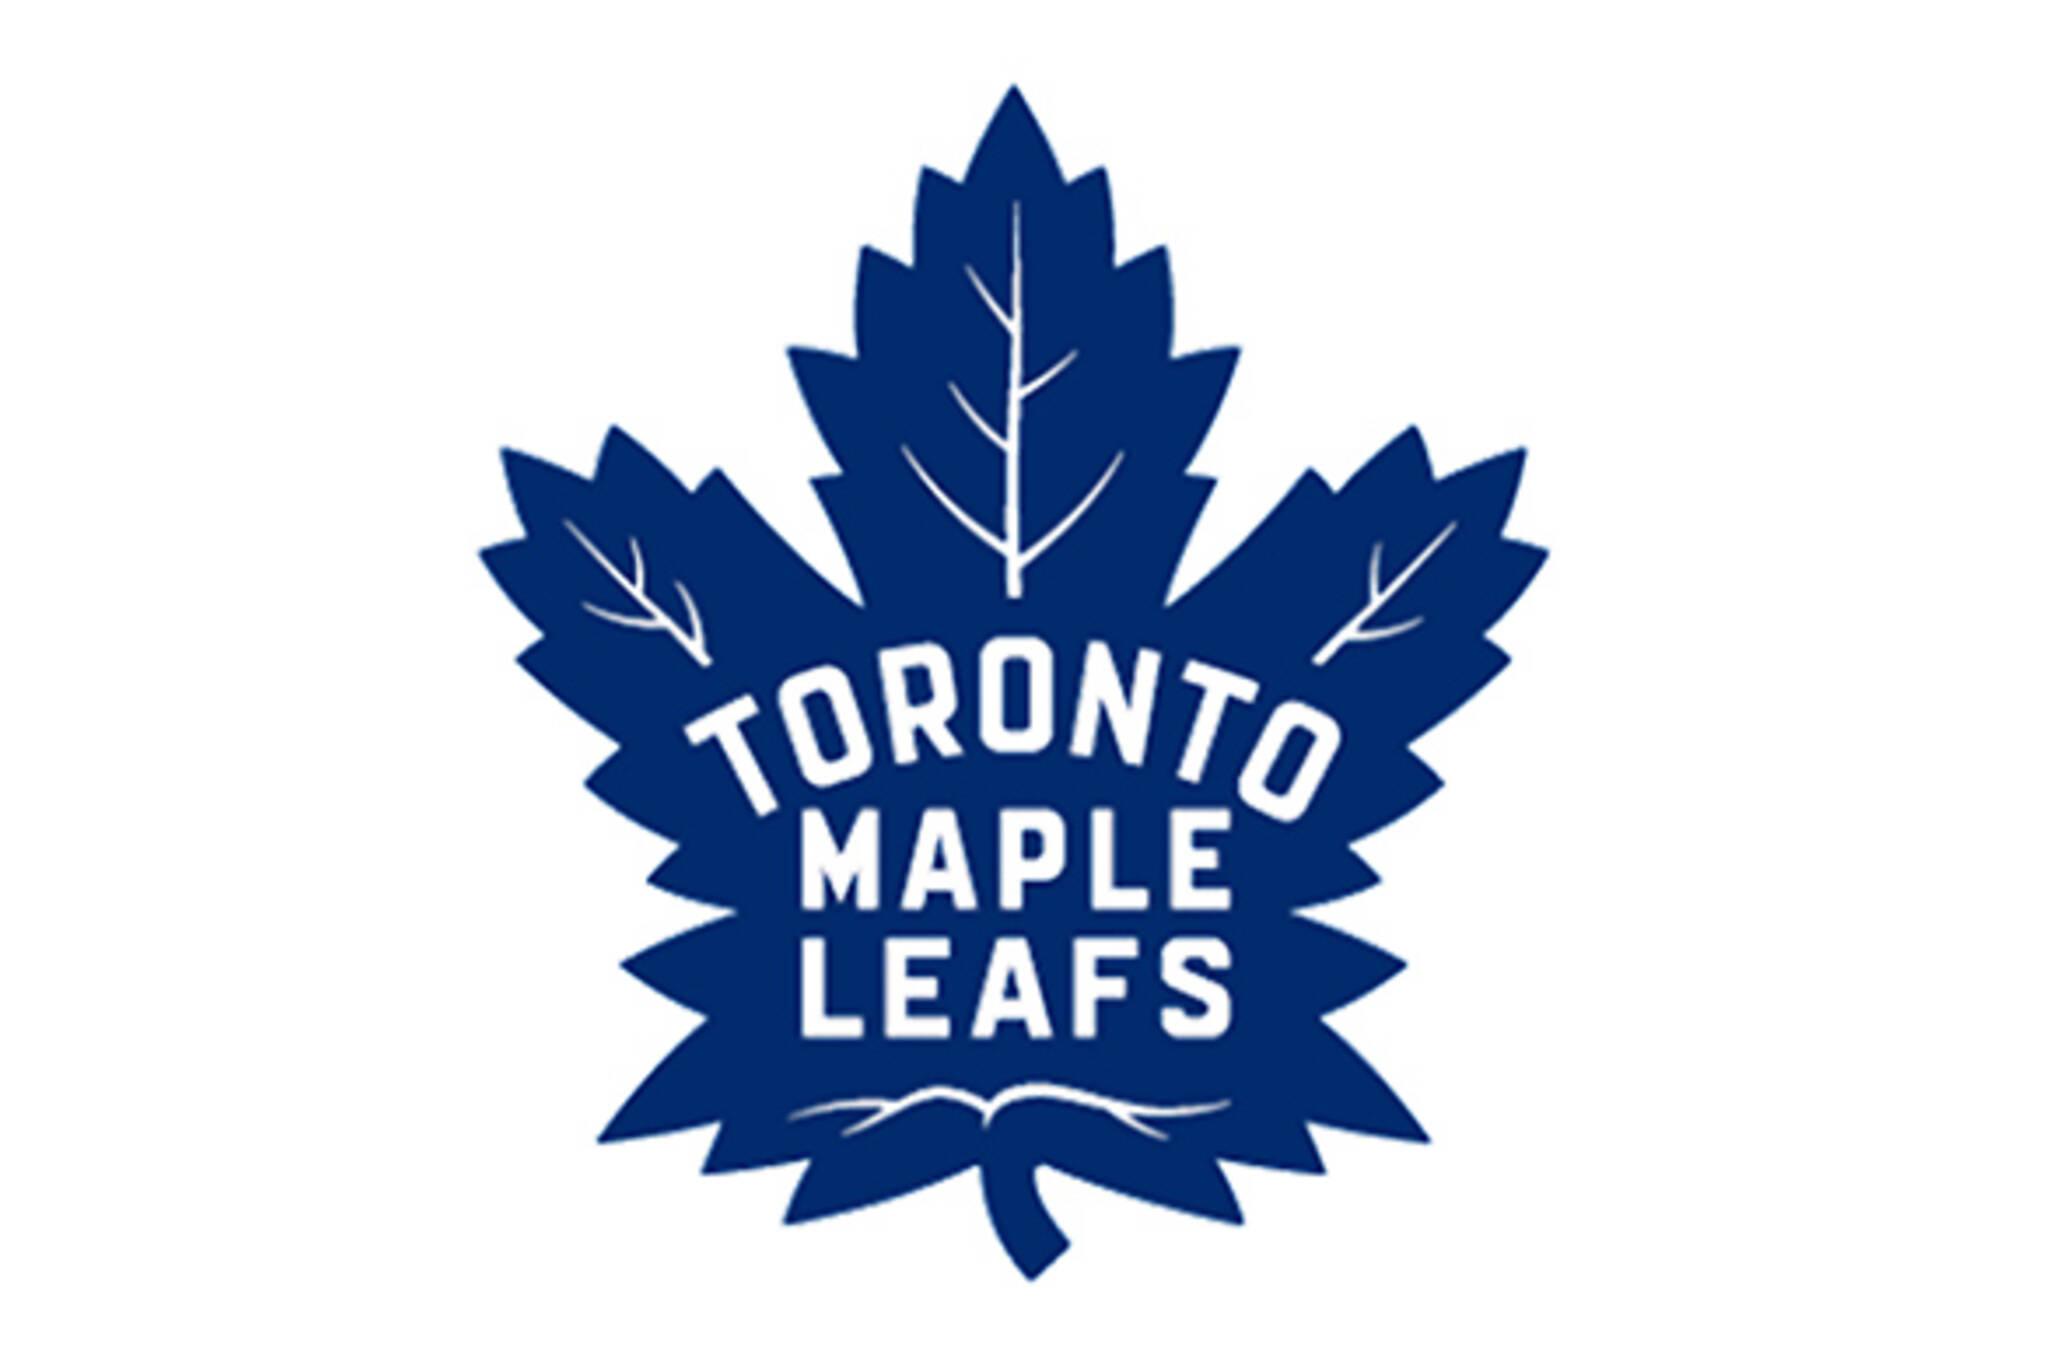 New Toronto Maple Leafs logo